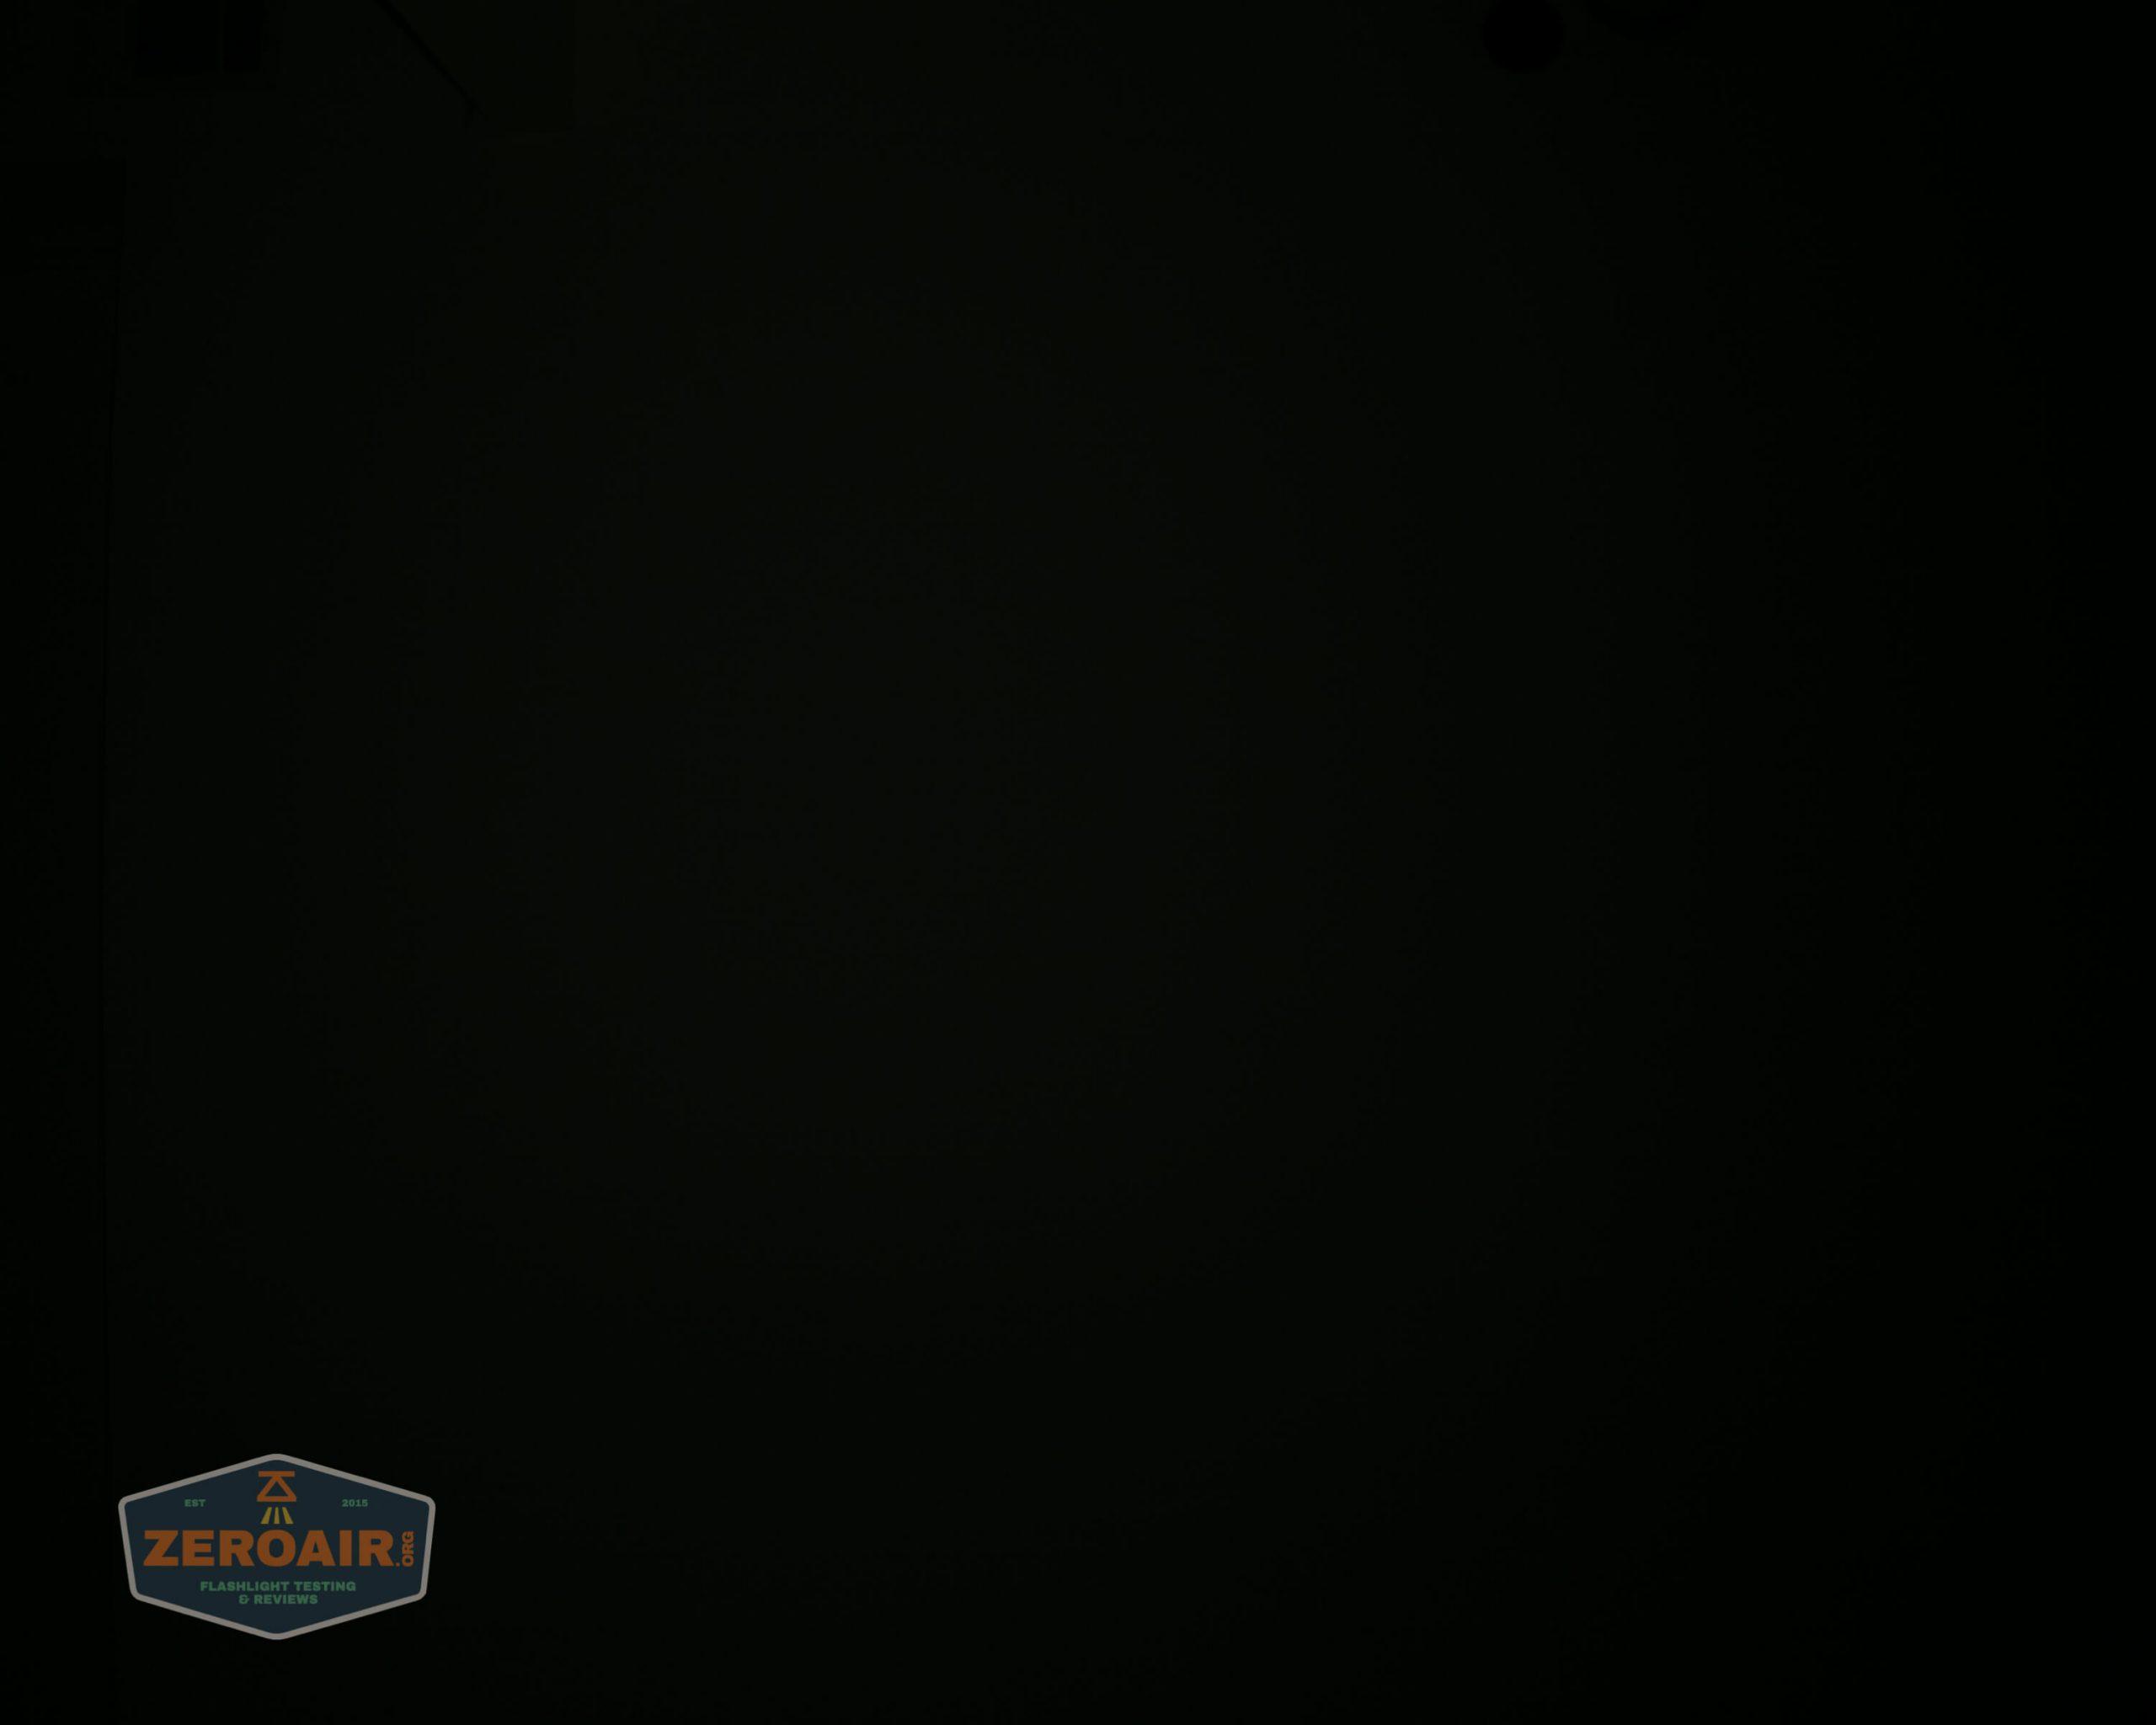 olight olantern lantern beamshots ceiling